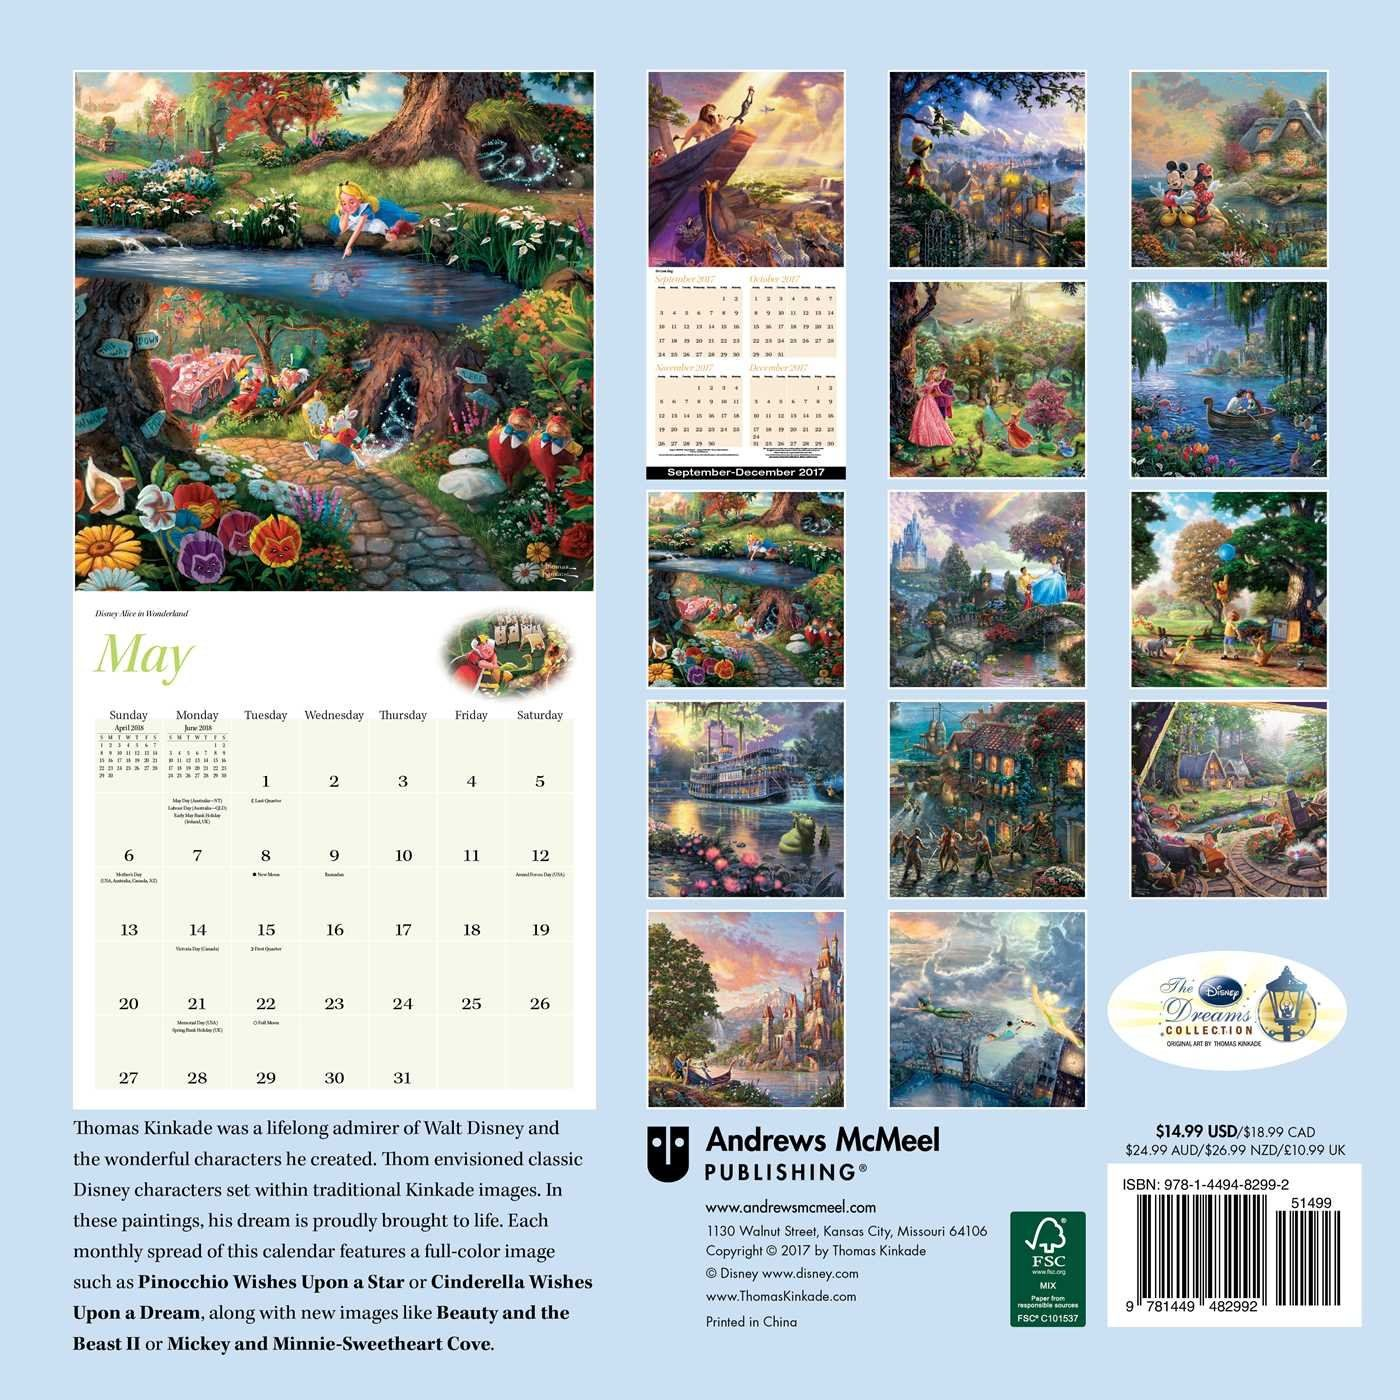 for christmas 2019 thomas kinkade the disney dreams collection 2018 wall calendar. Black Bedroom Furniture Sets. Home Design Ideas